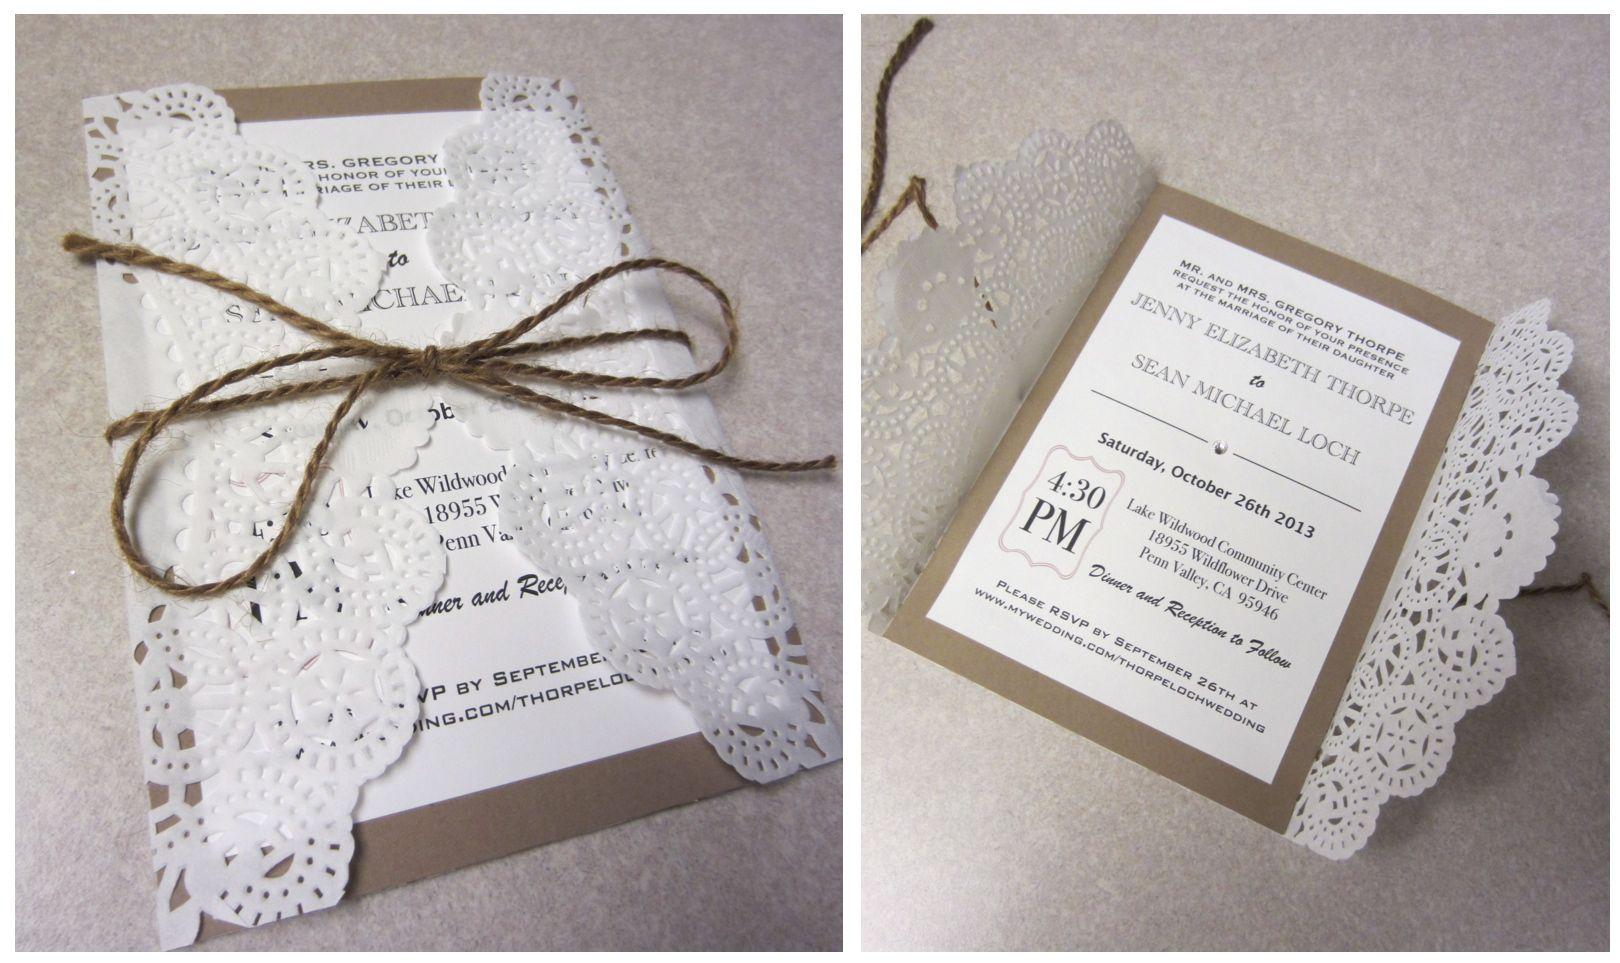 Handmade wedding invitations . Craft paper , doily , burlap rope tie ...